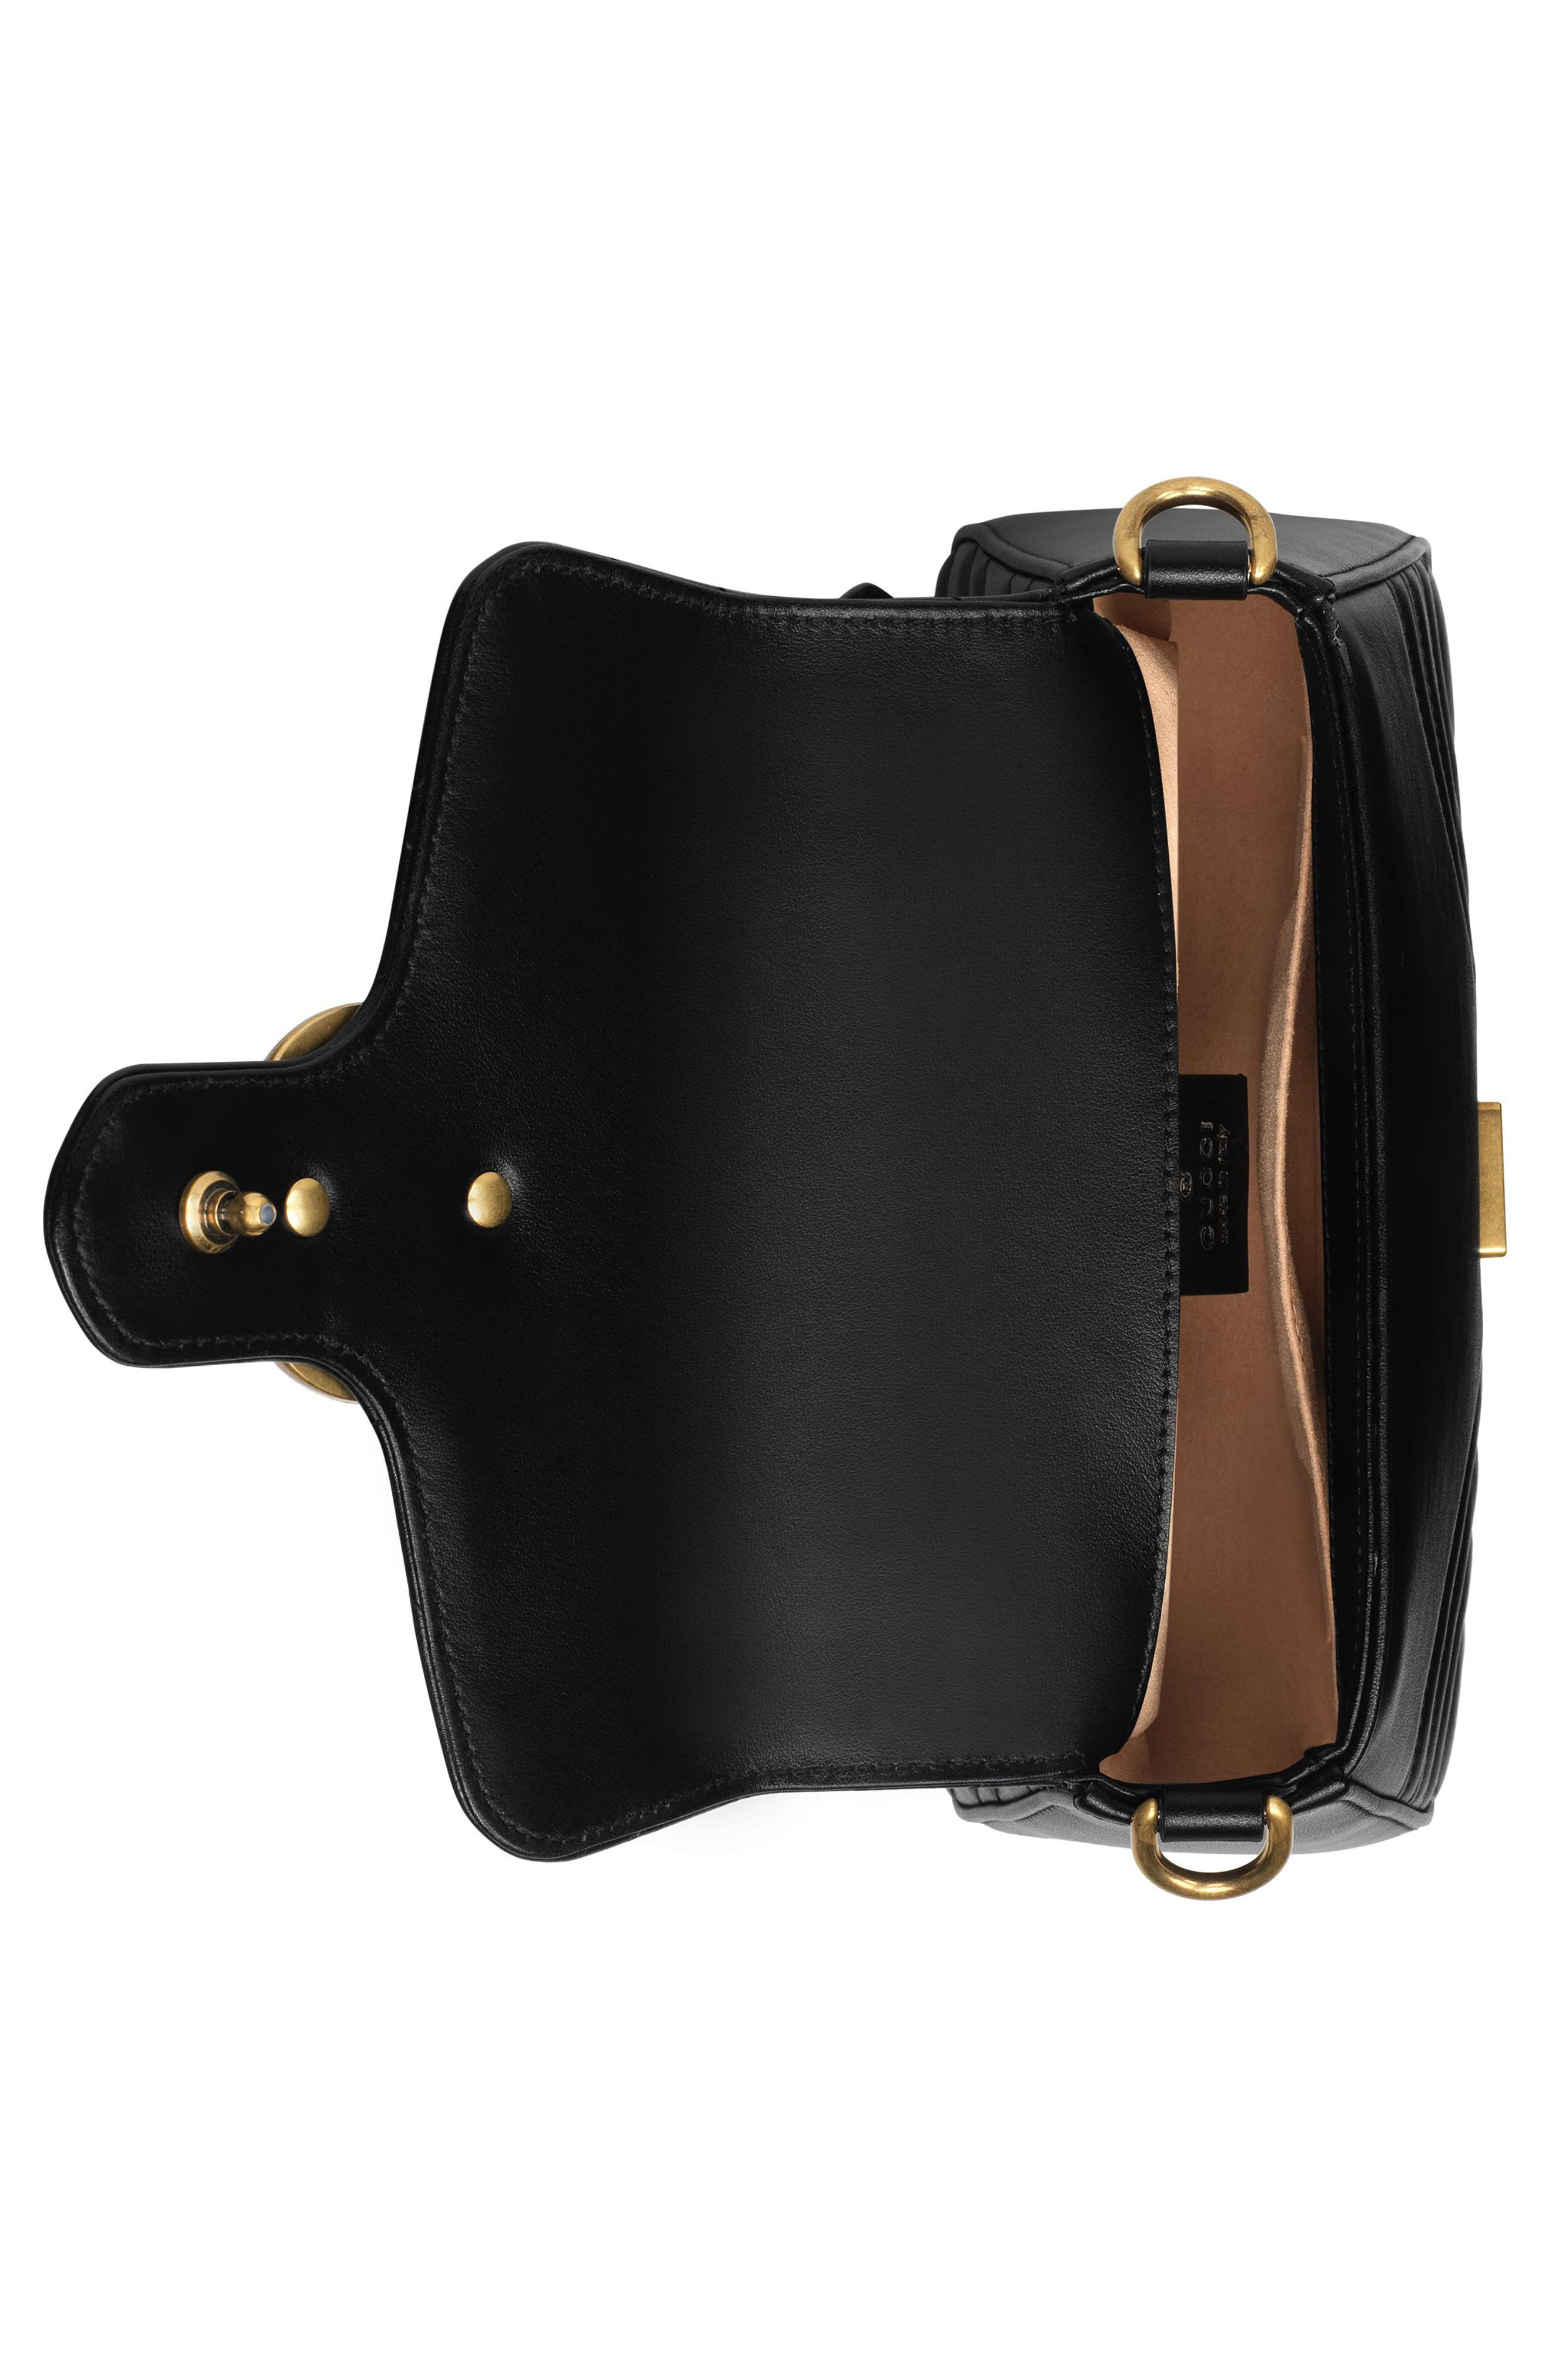 Marmont 2.0 Leather Top Handle Bag,                             Alternate thumbnail 3, color,                             NERO